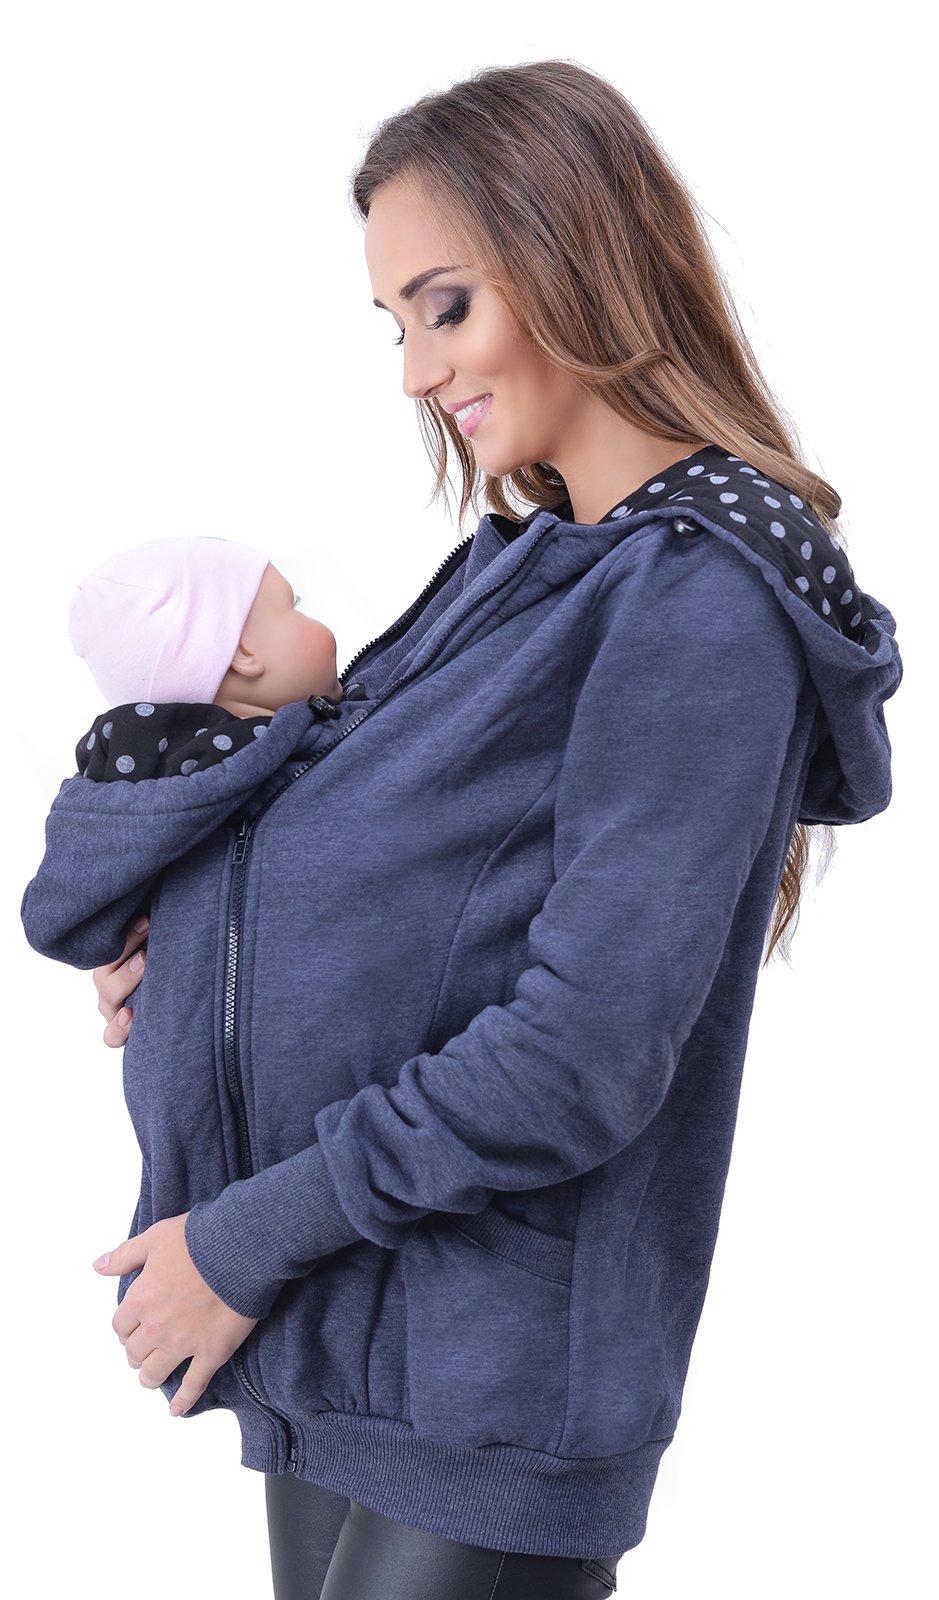 Mija - Maternity warm Hoodie / Jacket / Sweatshirt / for Baby Carriers 4046 (US8 / M, Jeans)